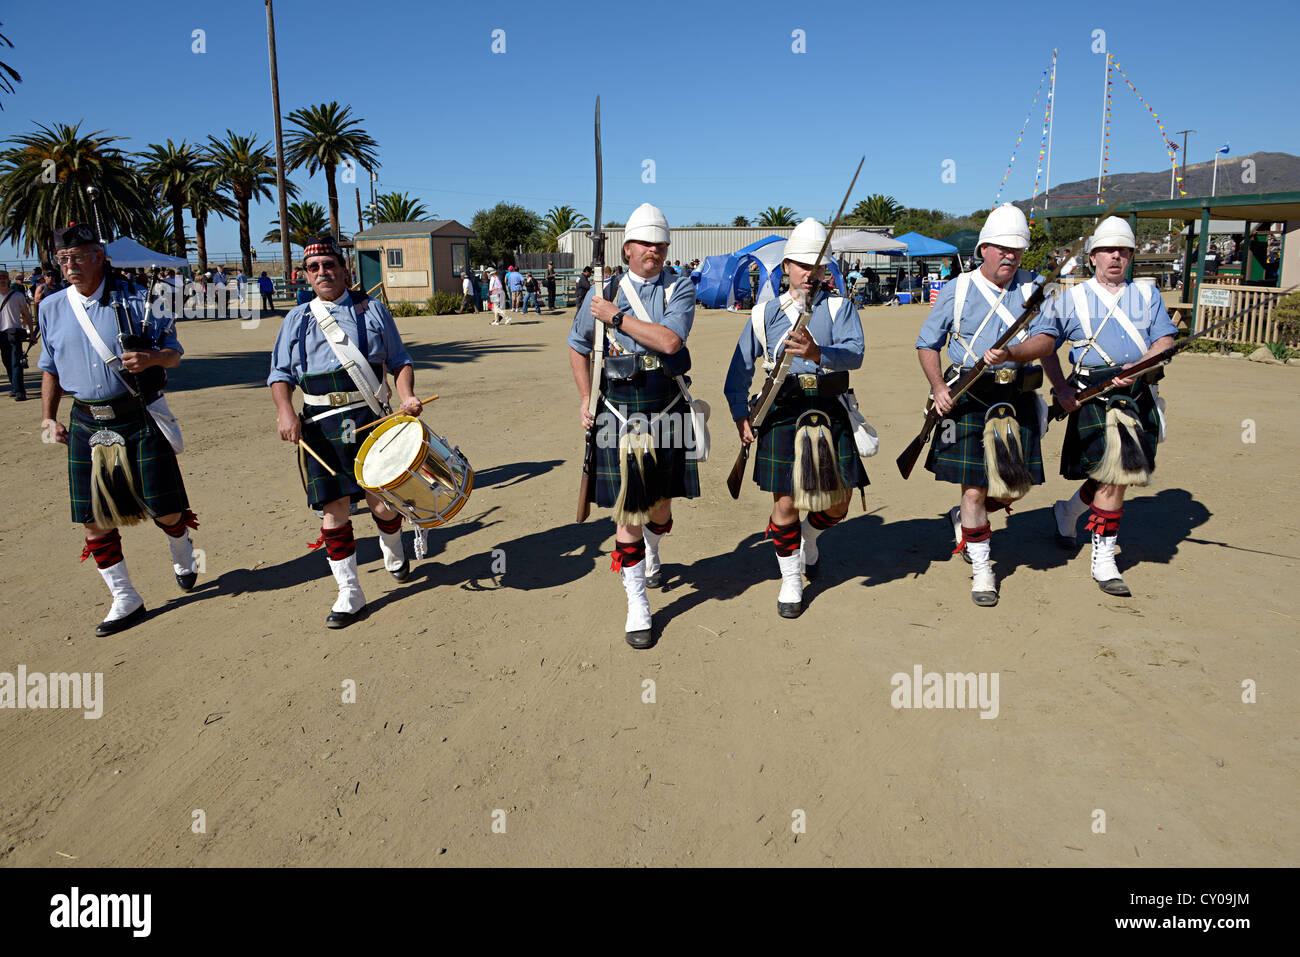 Bydand Forever California history 1st Battalion, Gordon Highlanders - Stock Image